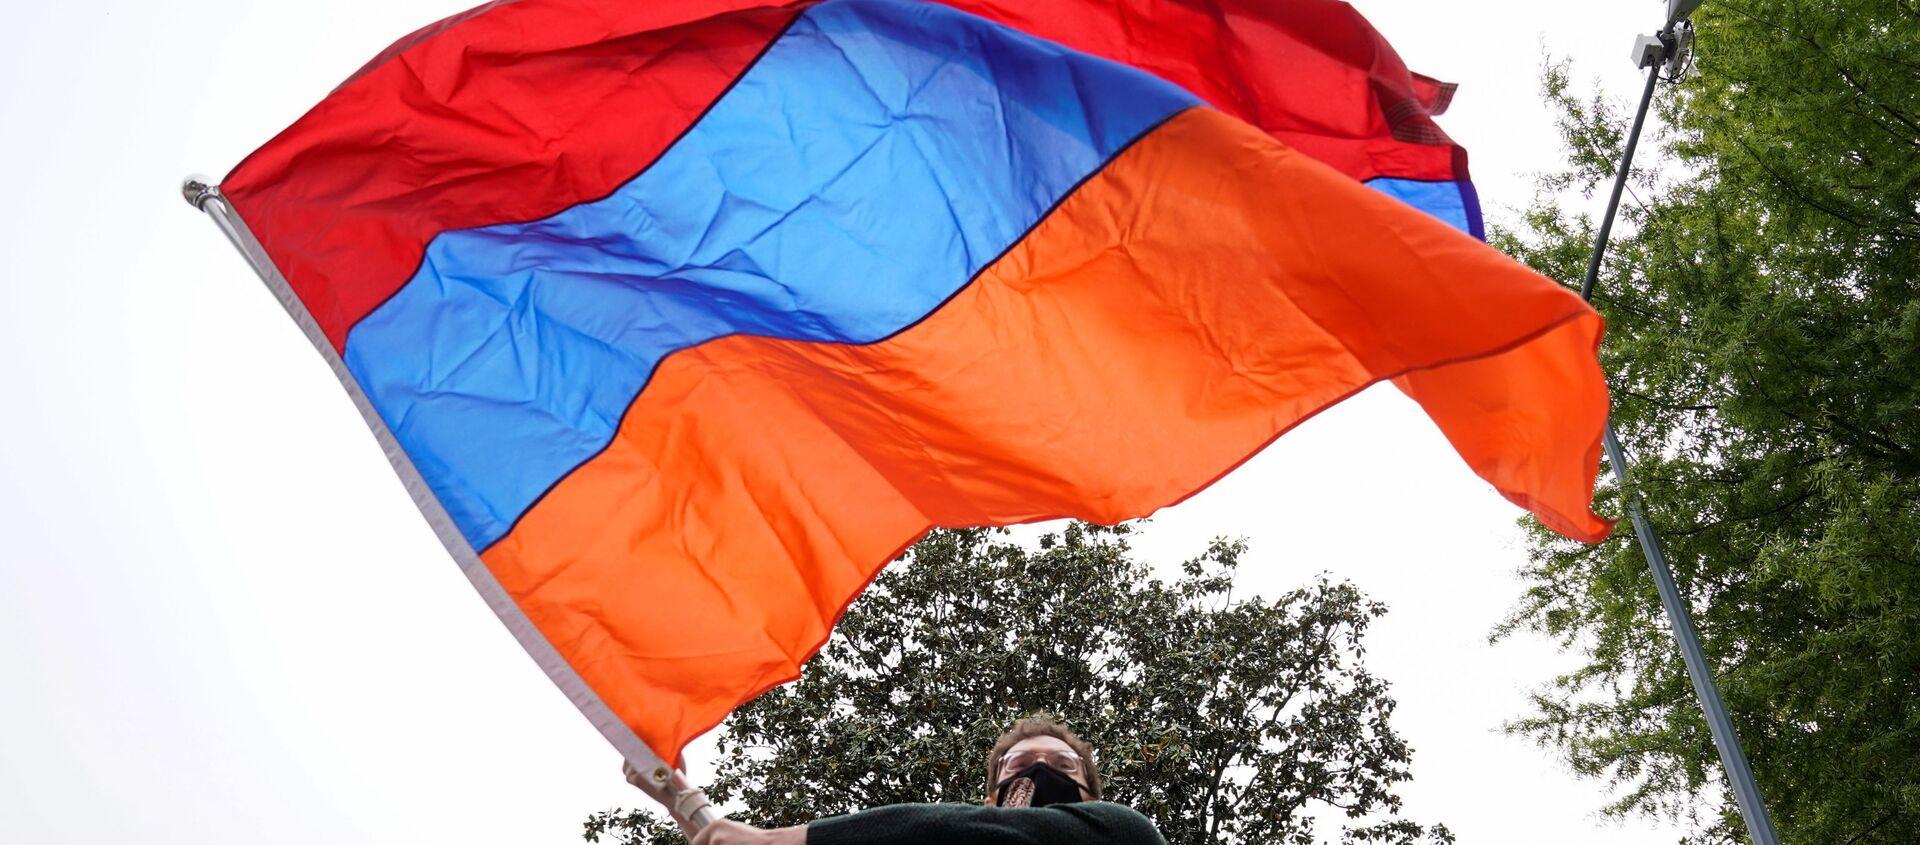 Armeni protestano davanti l'Ambasciata turca a Washington - Sputnik Italia, 1920, 28.04.2021